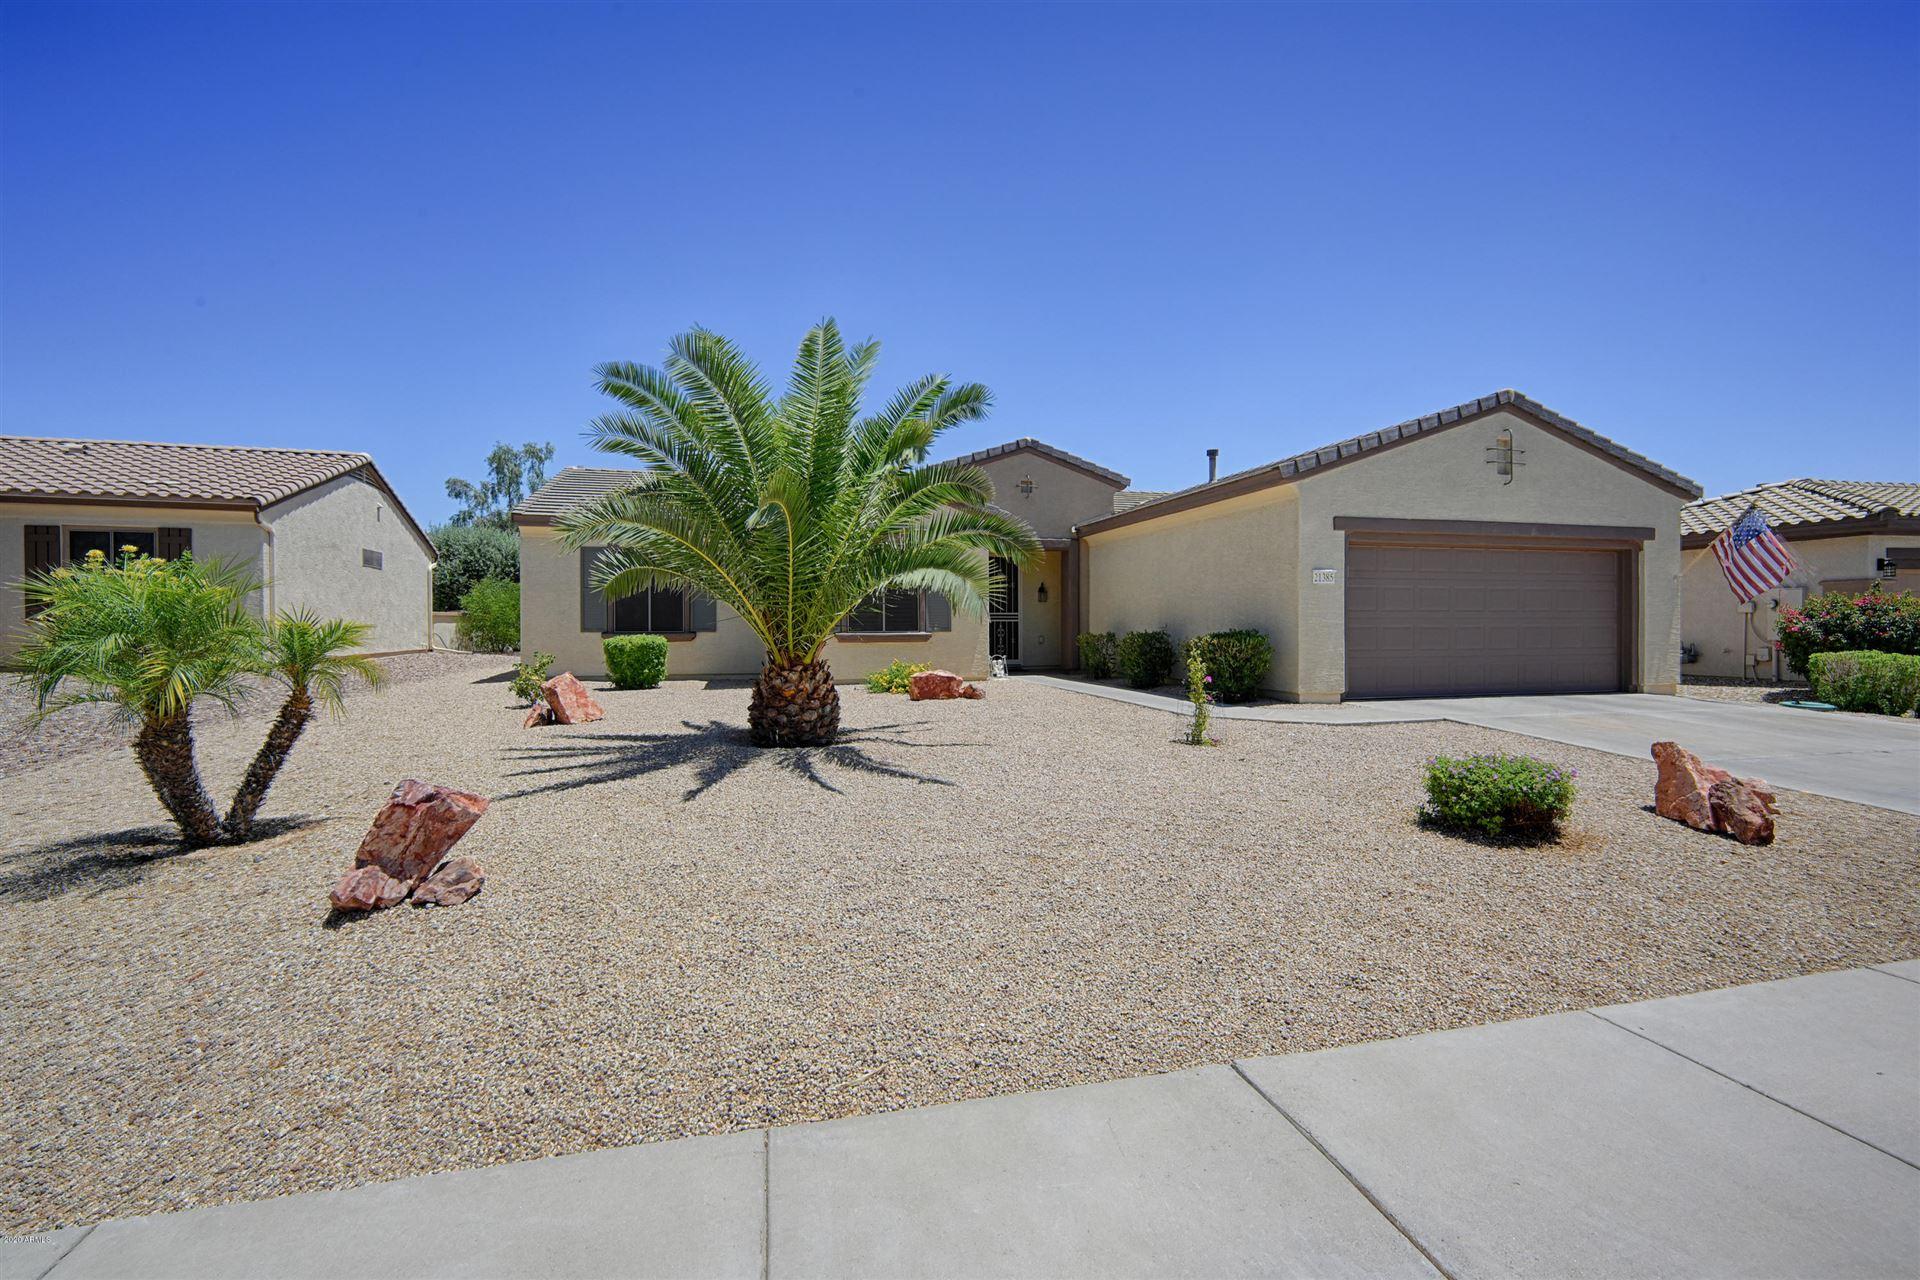 21385 N CLOUDCROFT Lane, Surprise, AZ 85387 - MLS#: 6095785